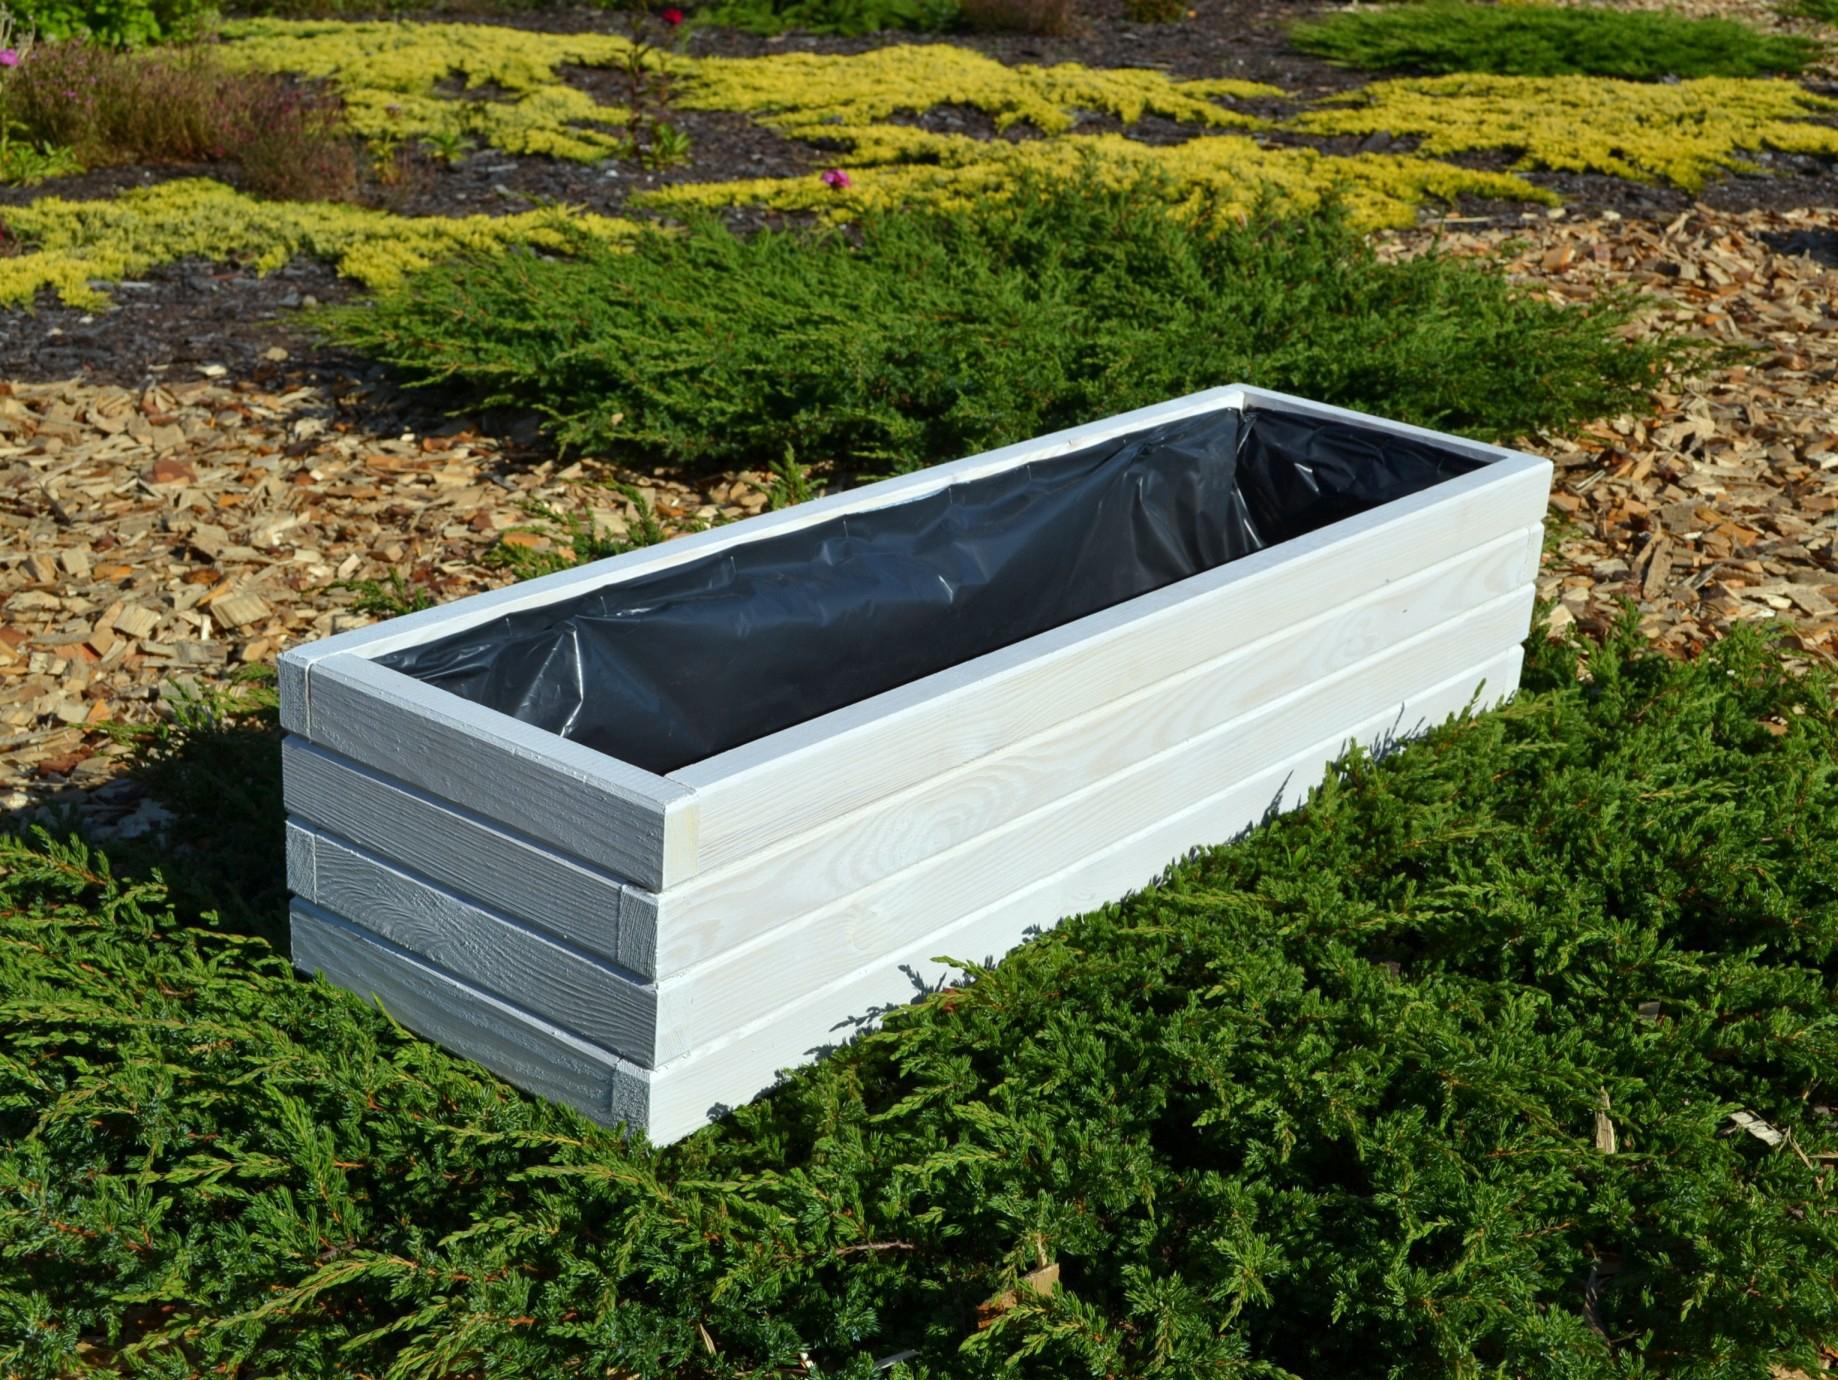 holzpflanzkasten pflanzk bel garten terrasse l nge 60 80 100cm d2 wei grau ebay. Black Bedroom Furniture Sets. Home Design Ideas